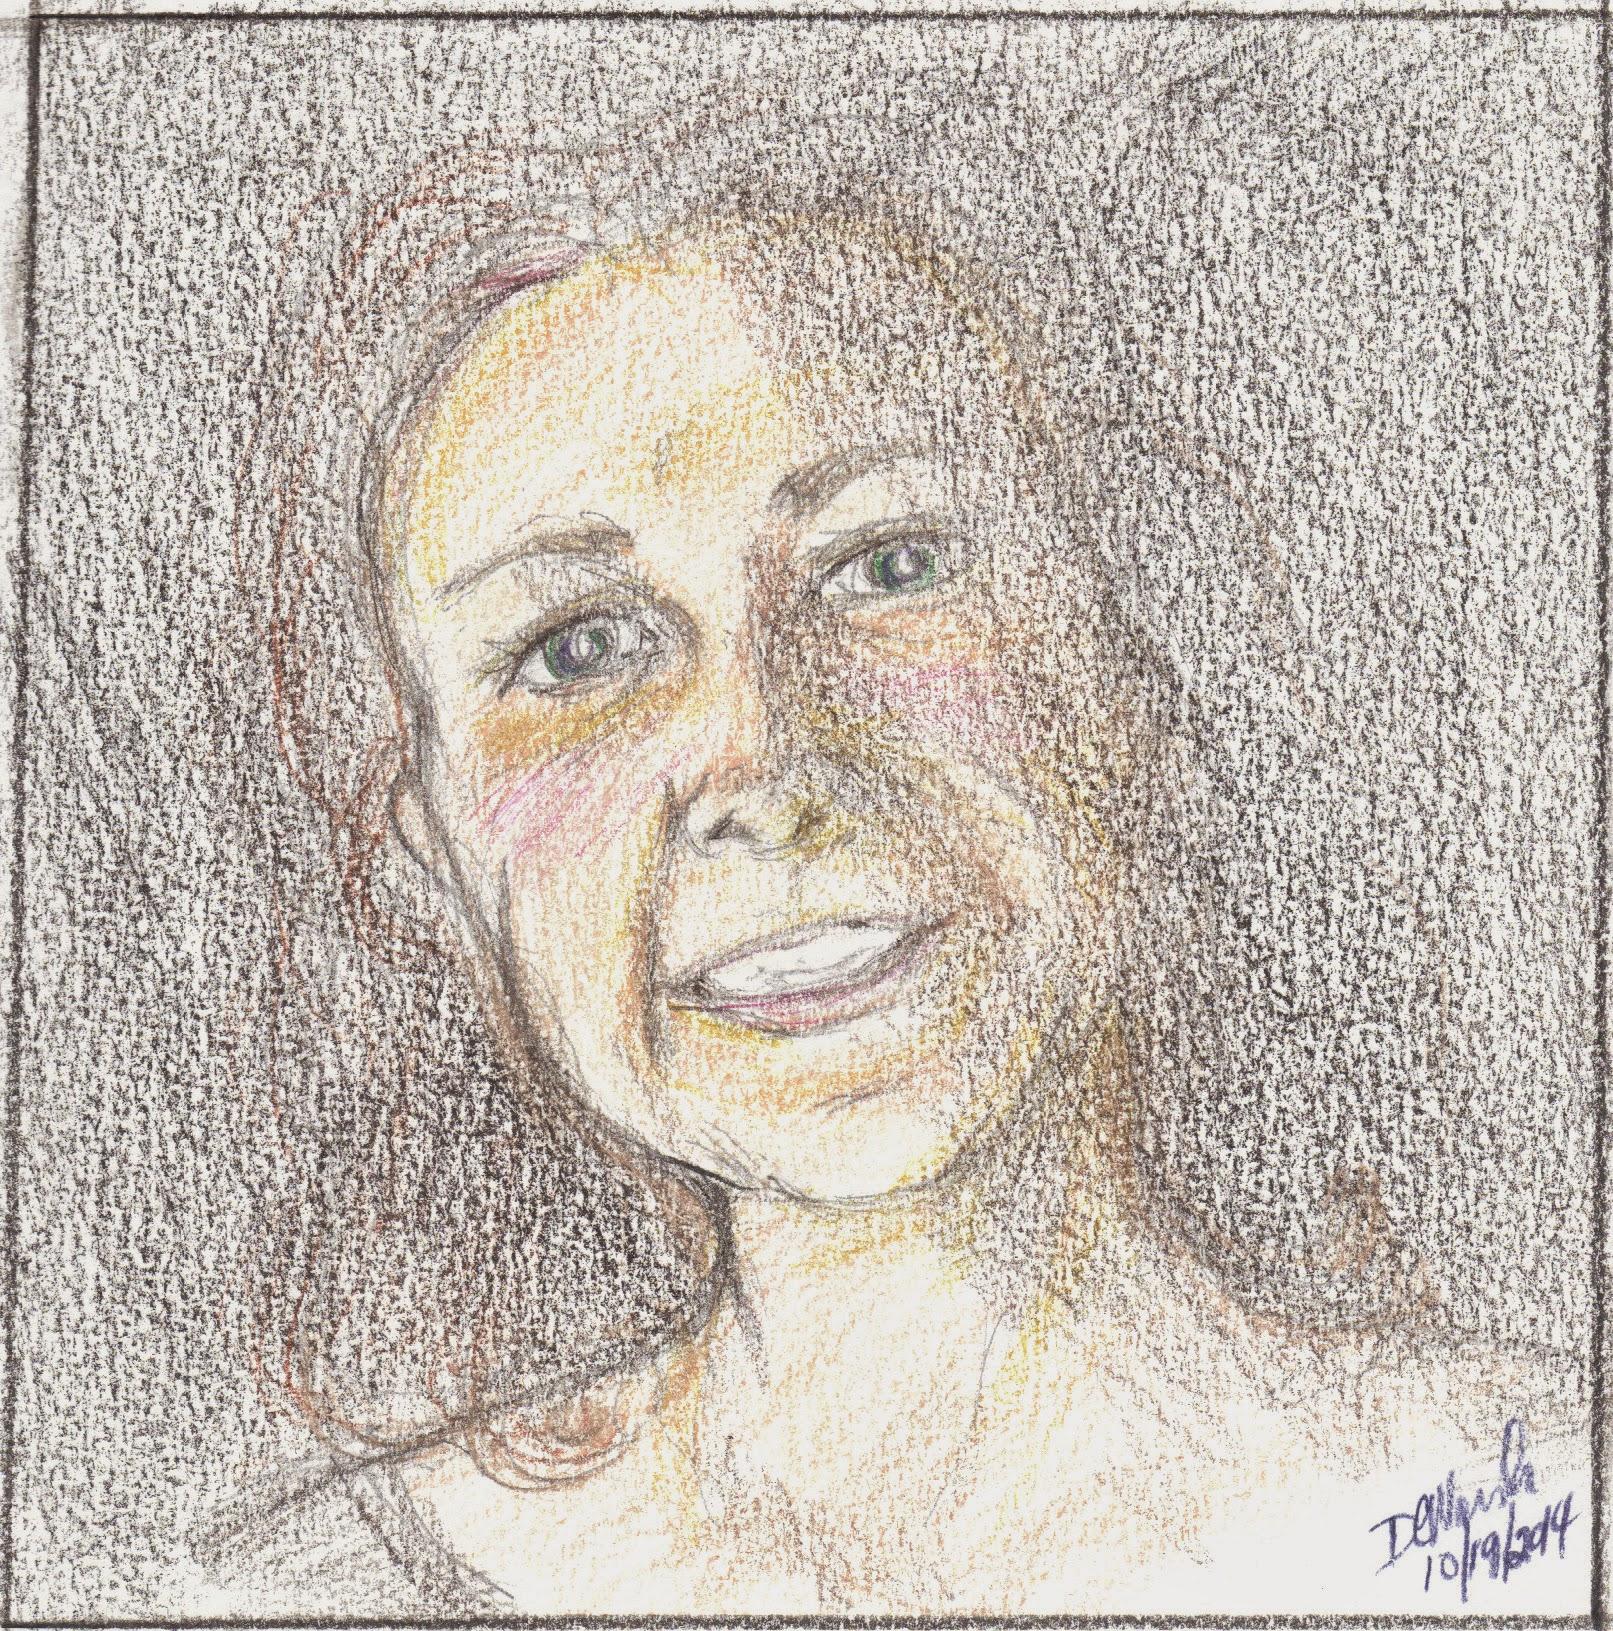 Sketchbook - Self Portrait (2014)